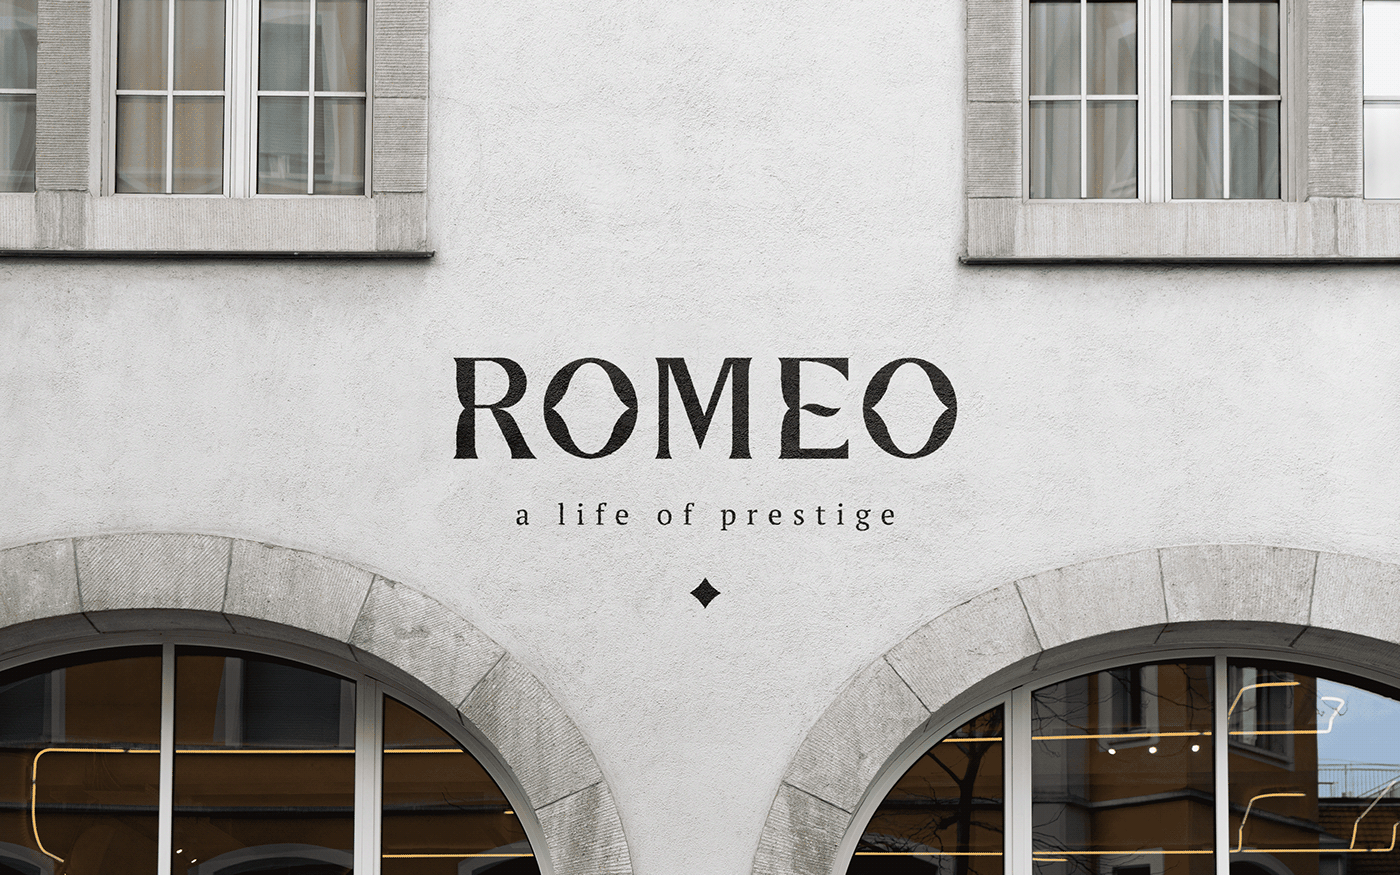 Bundles Classic clothes Ecommerce Fashion  Menswear Romeo sets